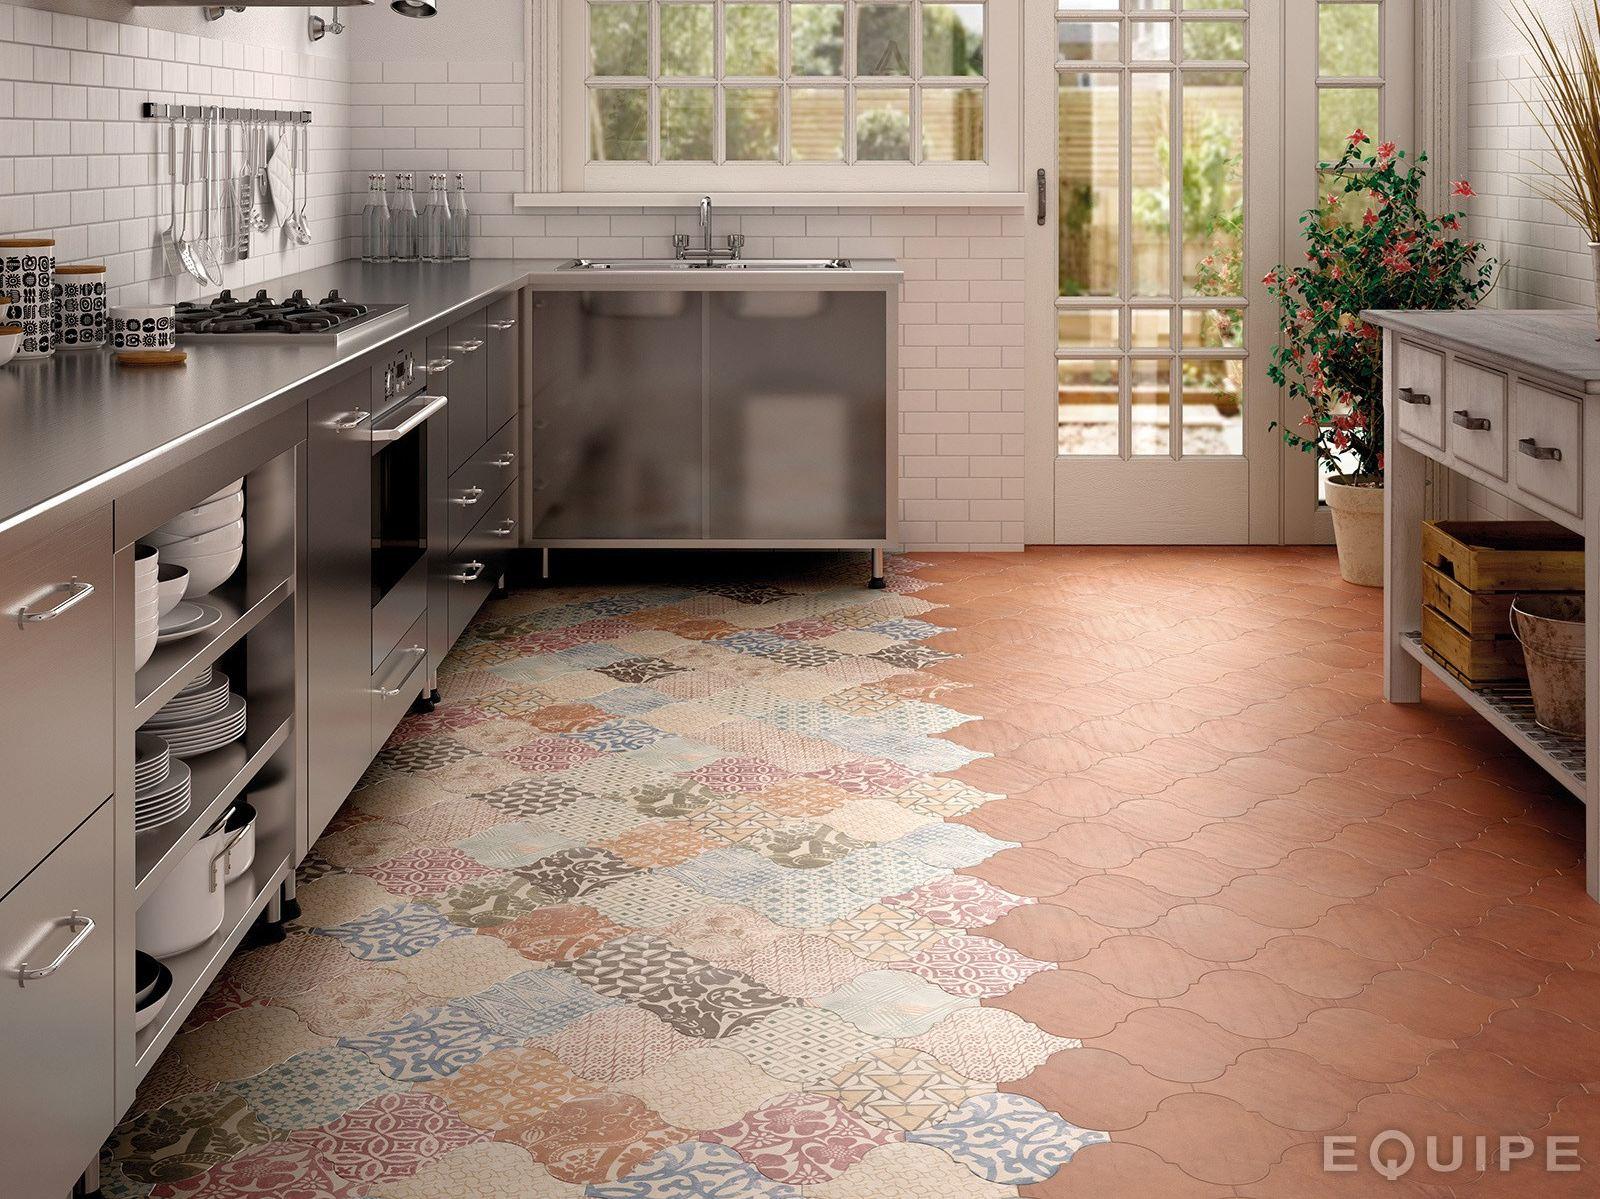 flooring tile in kitchen full size of kitchen decoration:kitchen tiles backsplash small kitchen tiles  design kitchen XPYKCBD